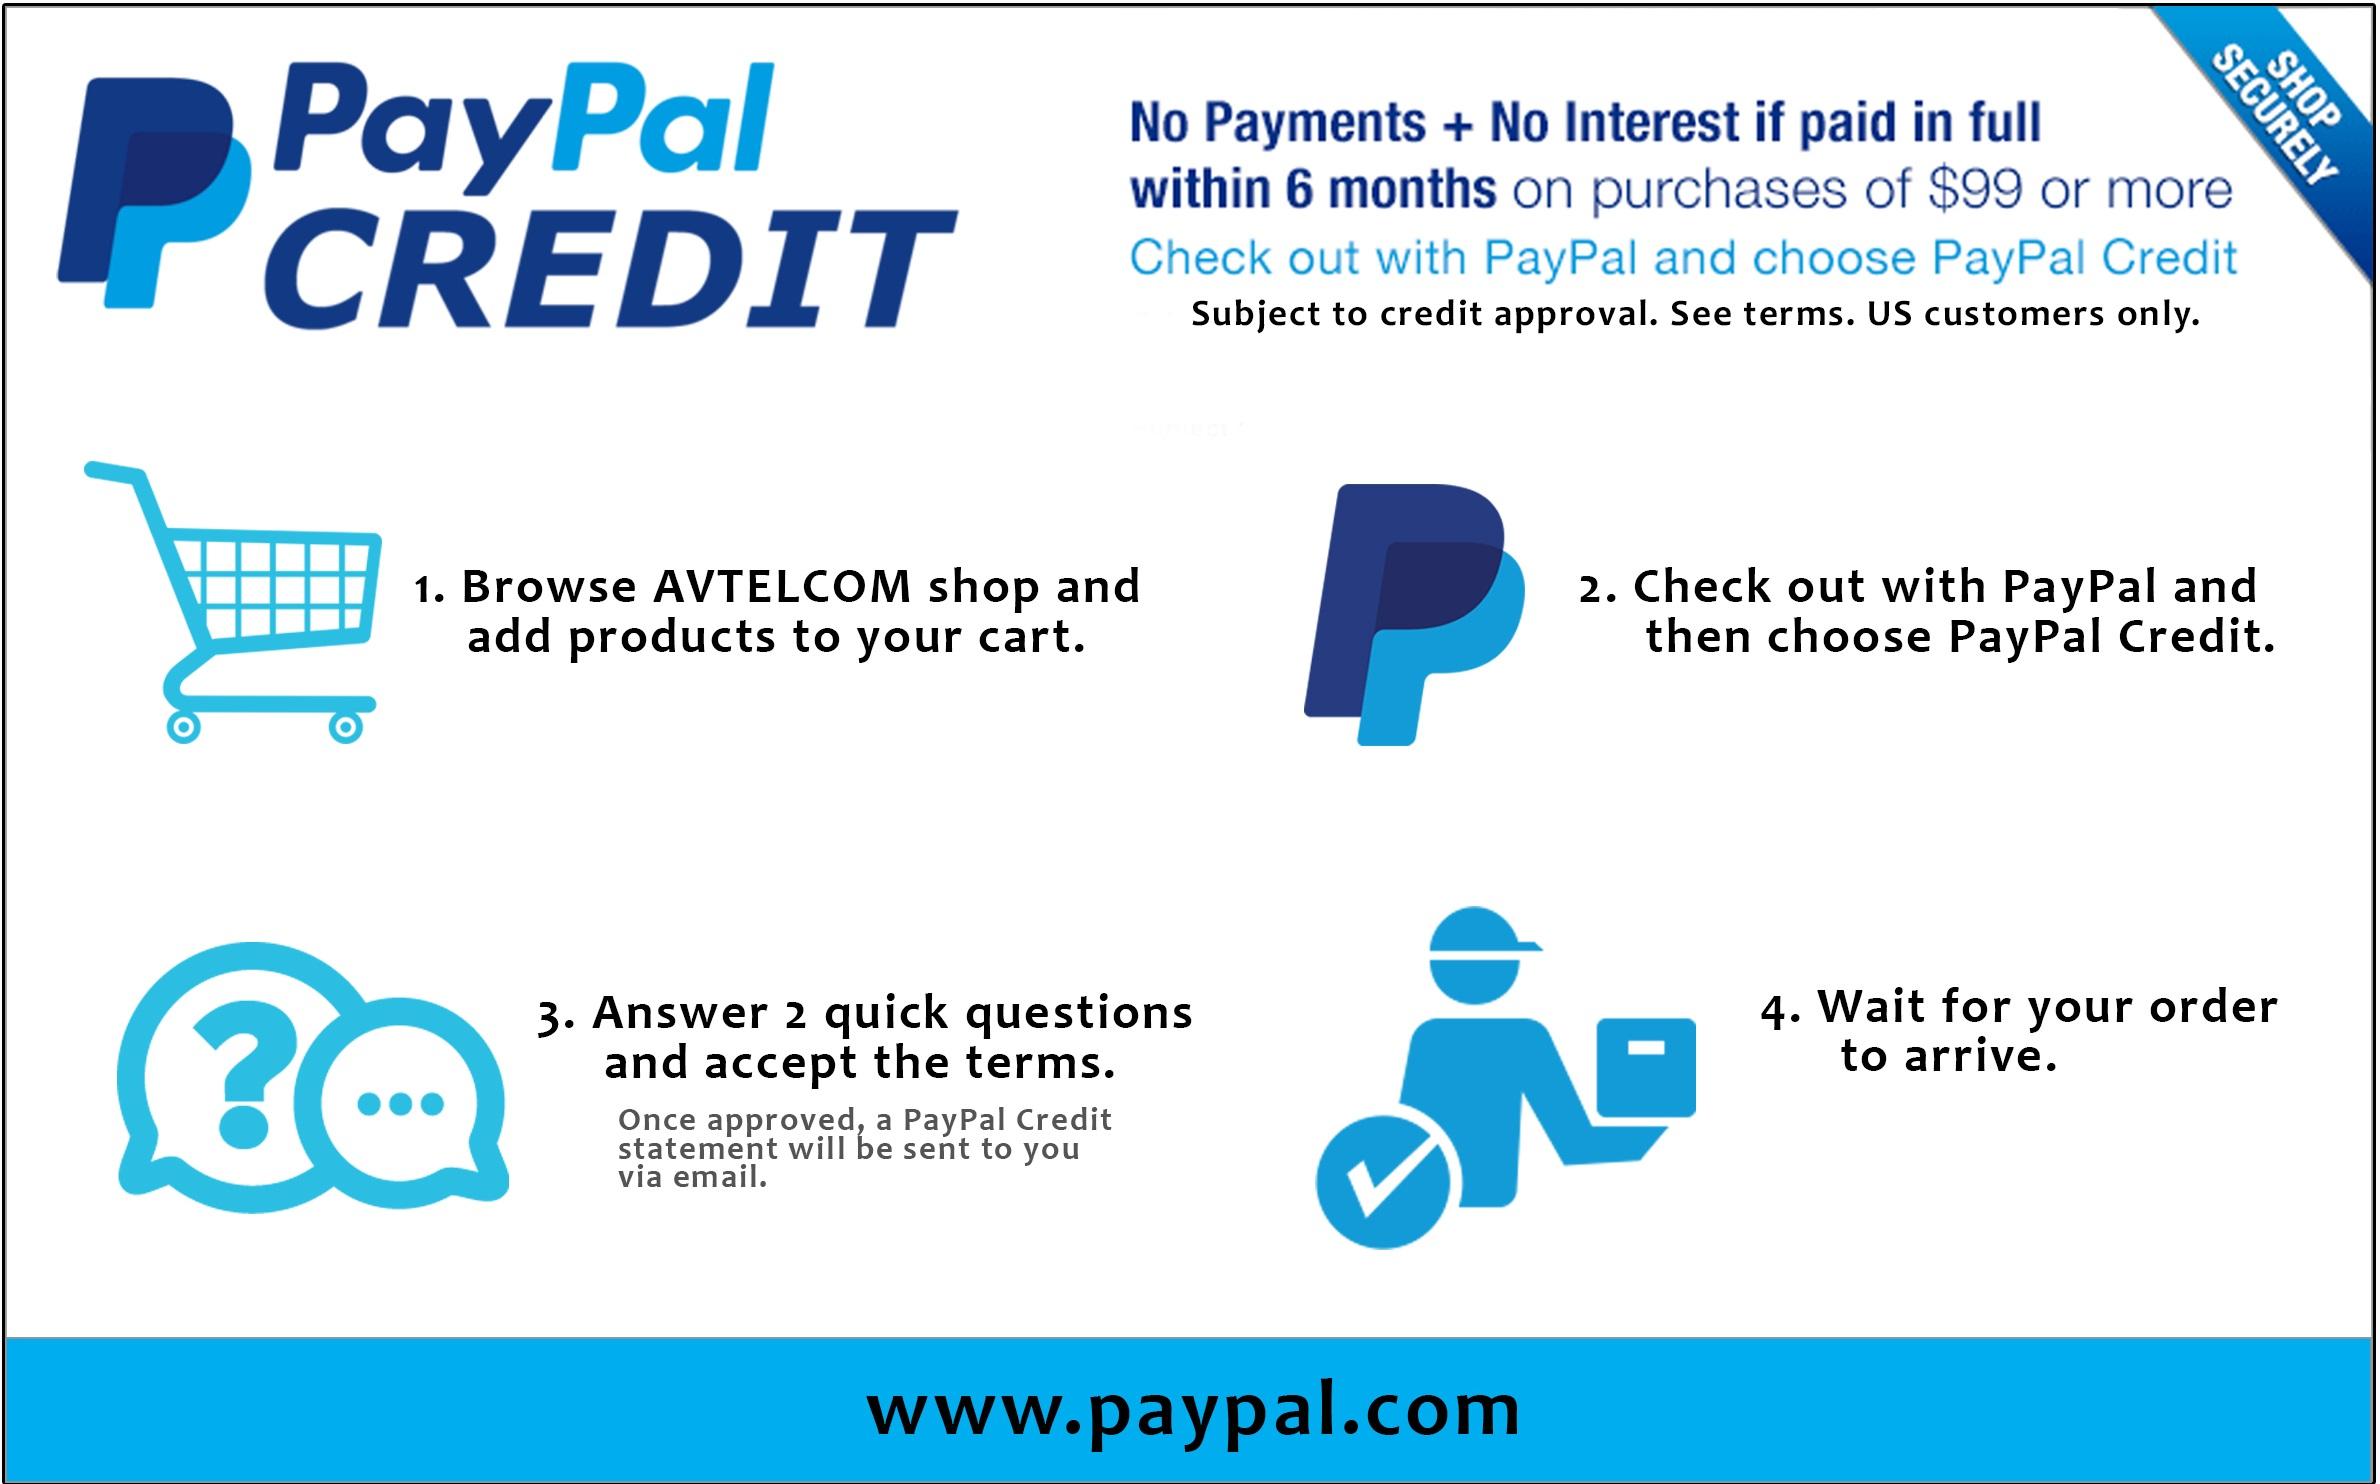 paypal-3.jpg